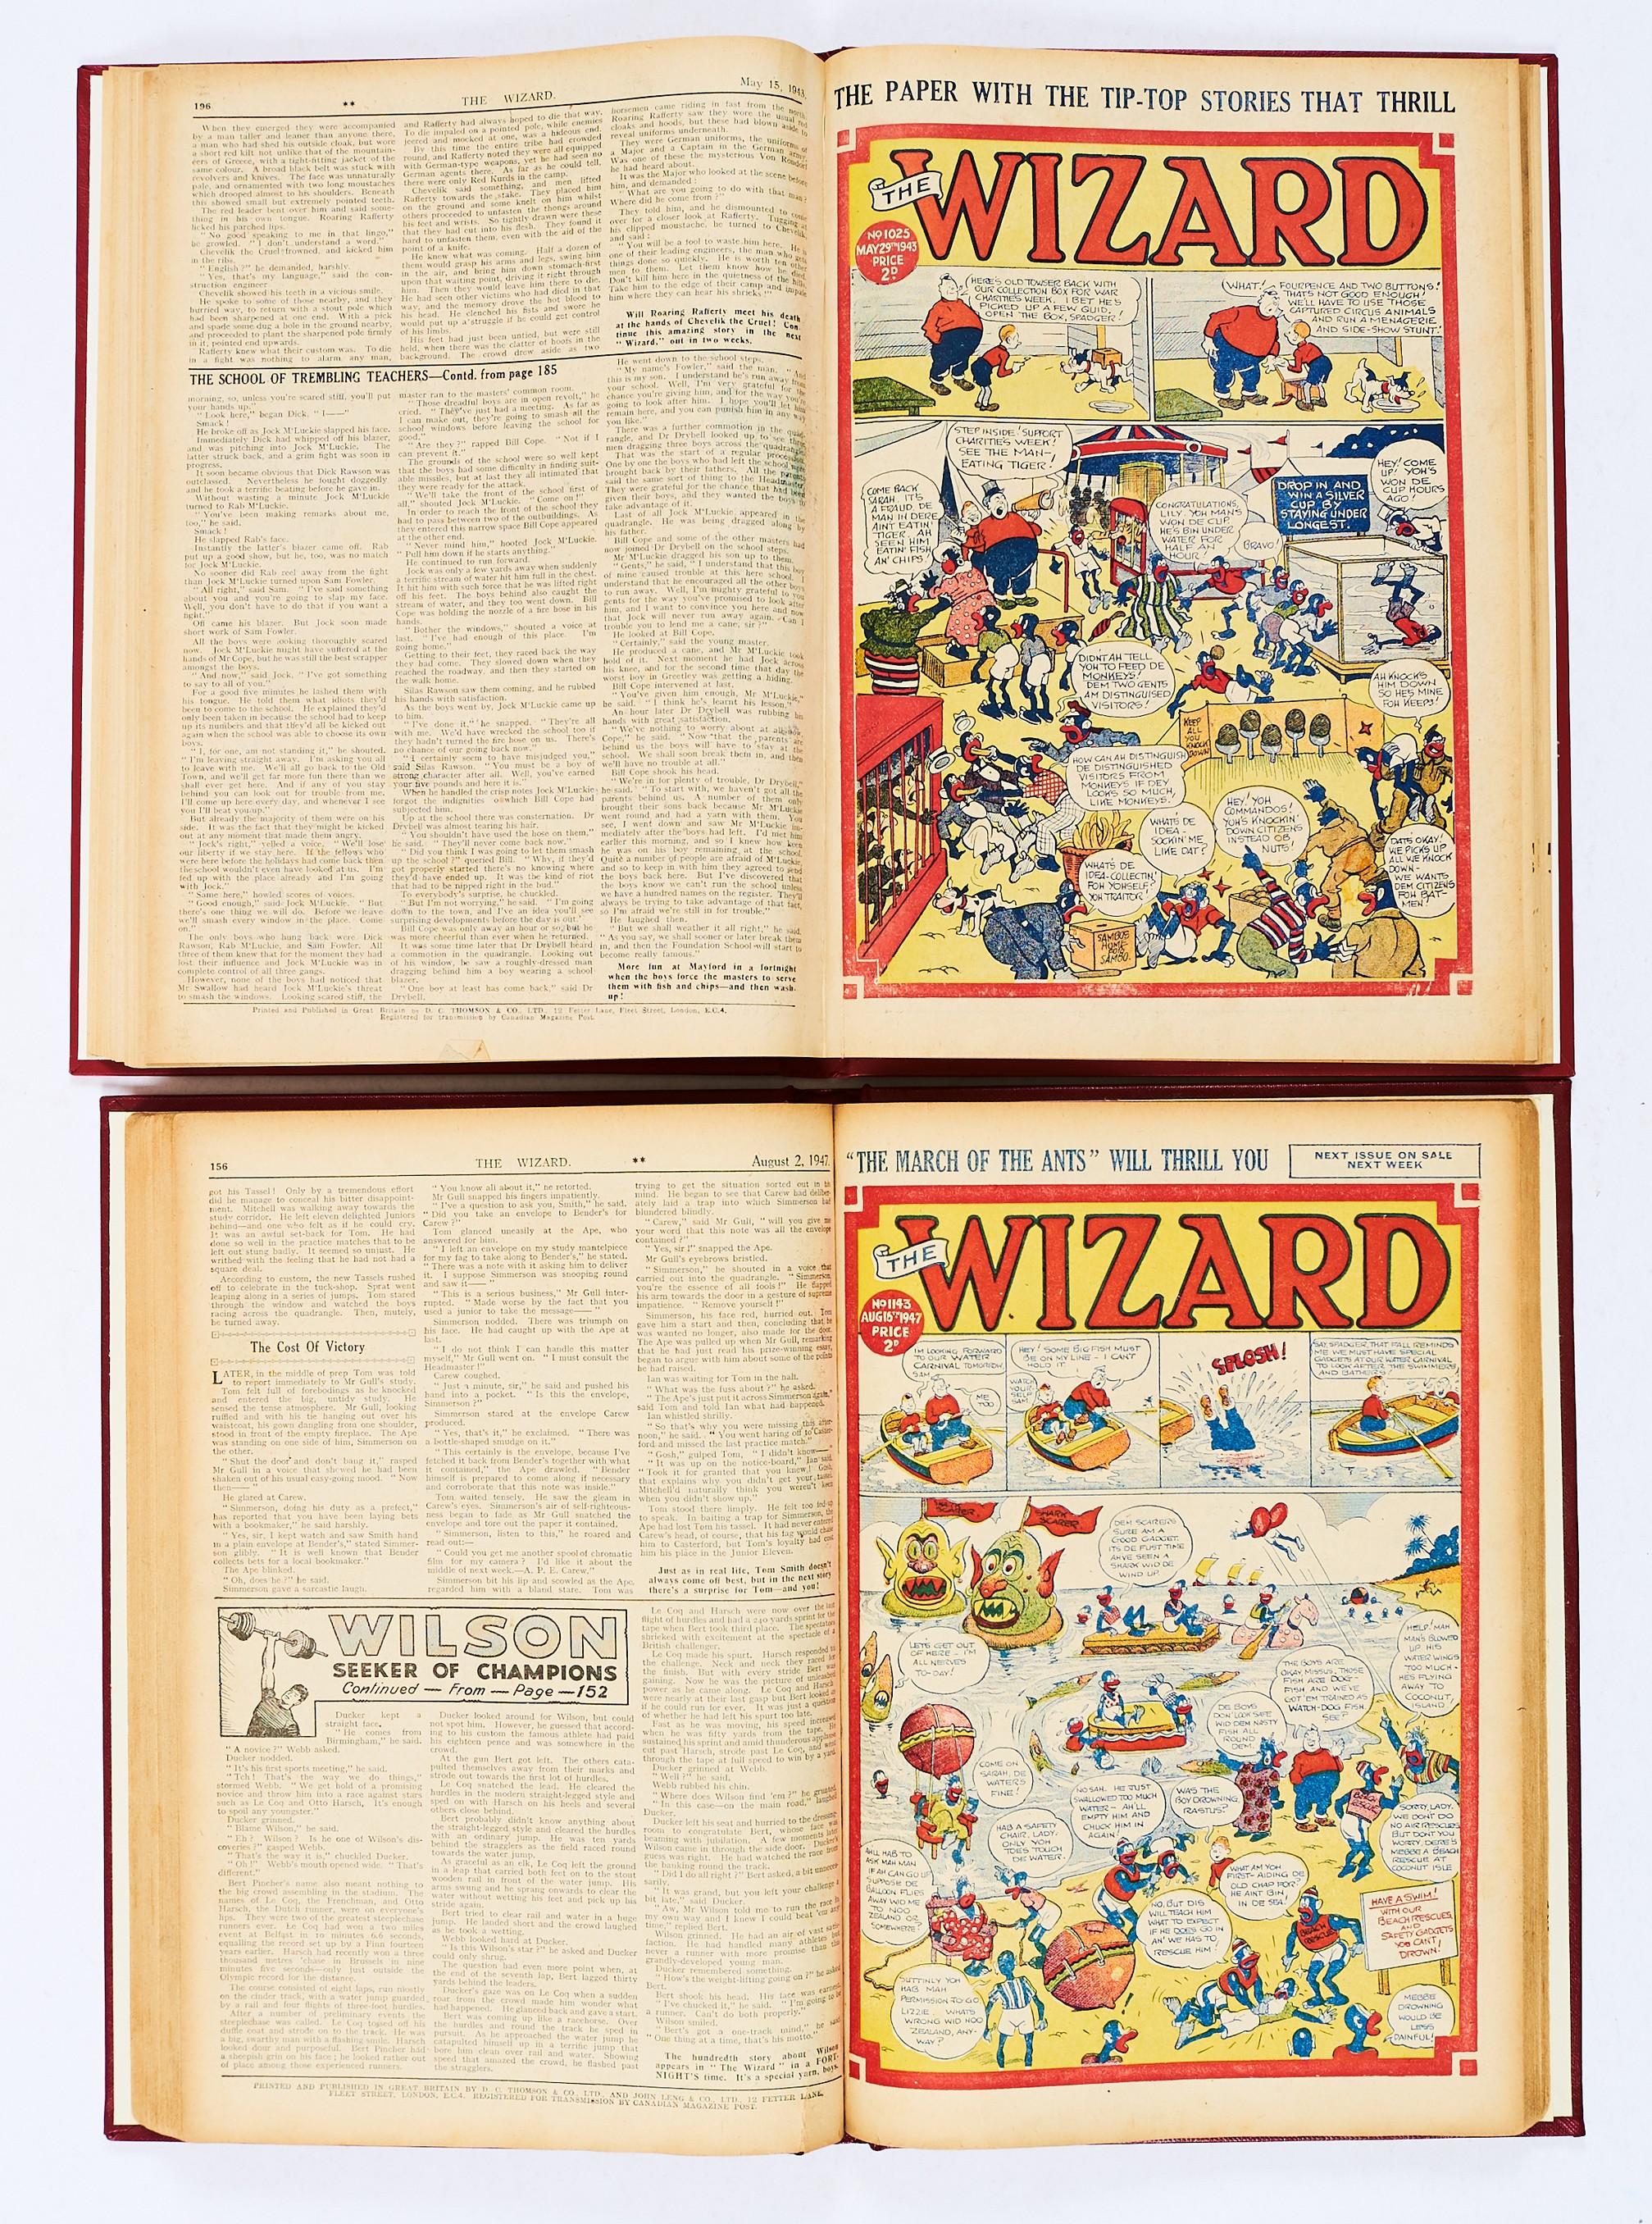 Lot 39 - Wizard (Jan-Jun 1943) 1015-1027. Half-year of propaganda war issues. With Wizard (Mar-Oct 1947)